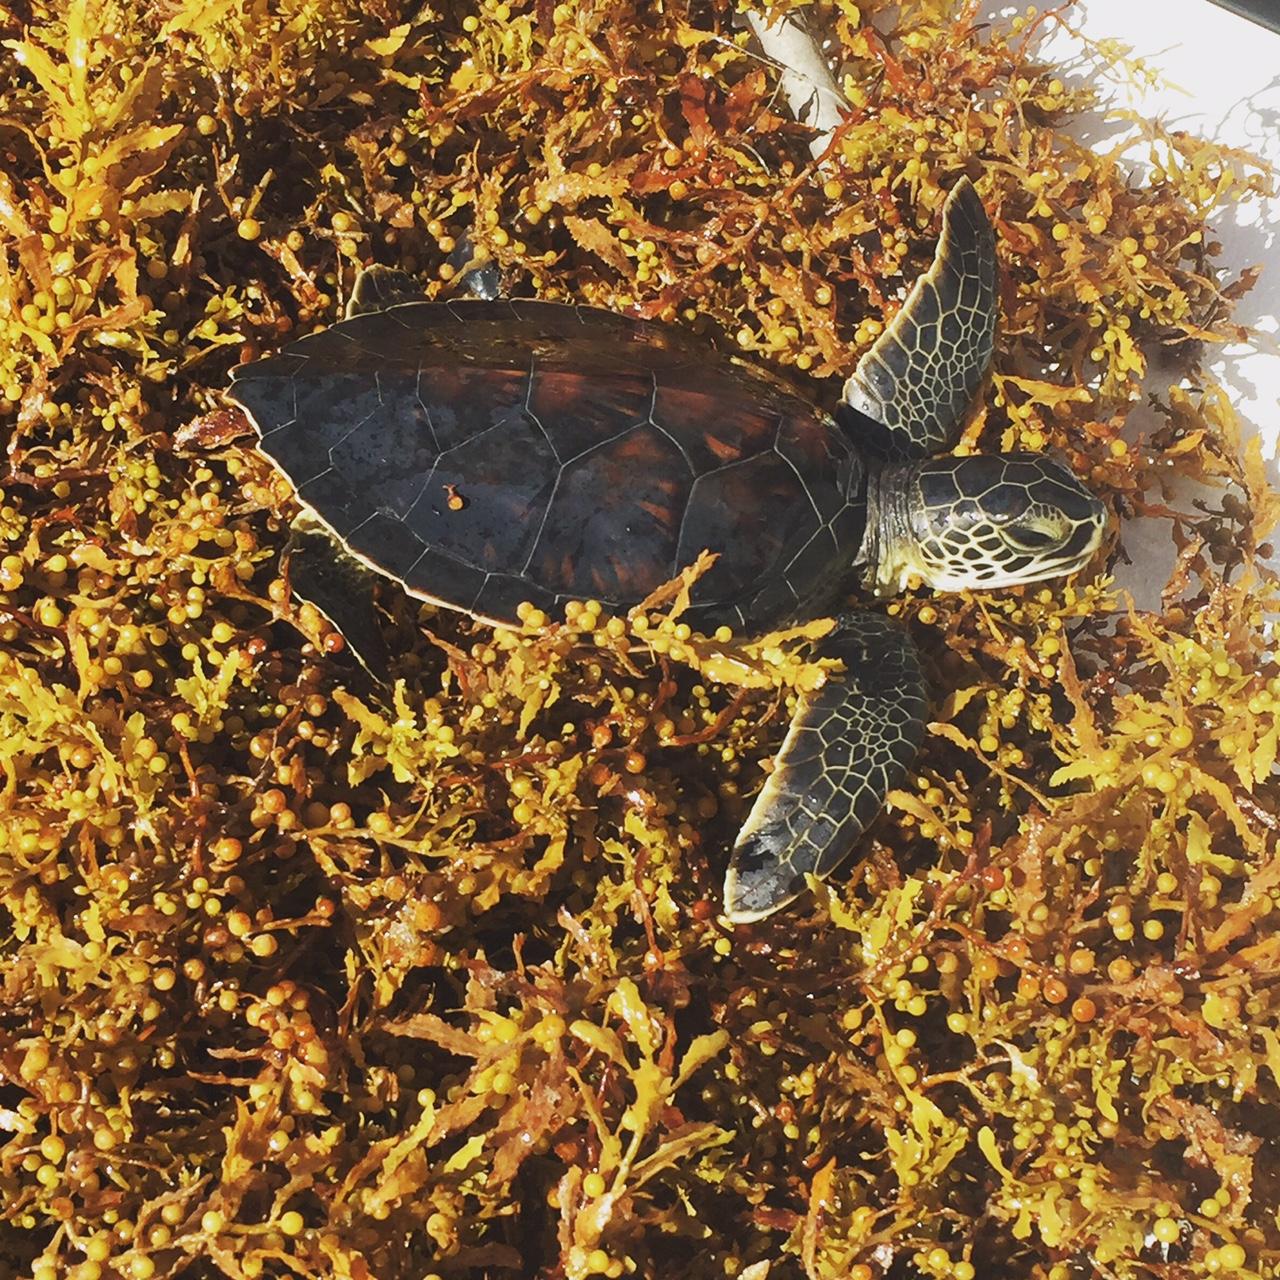 Une jeune tortue de mer verte dans un tapis d'algues brunes